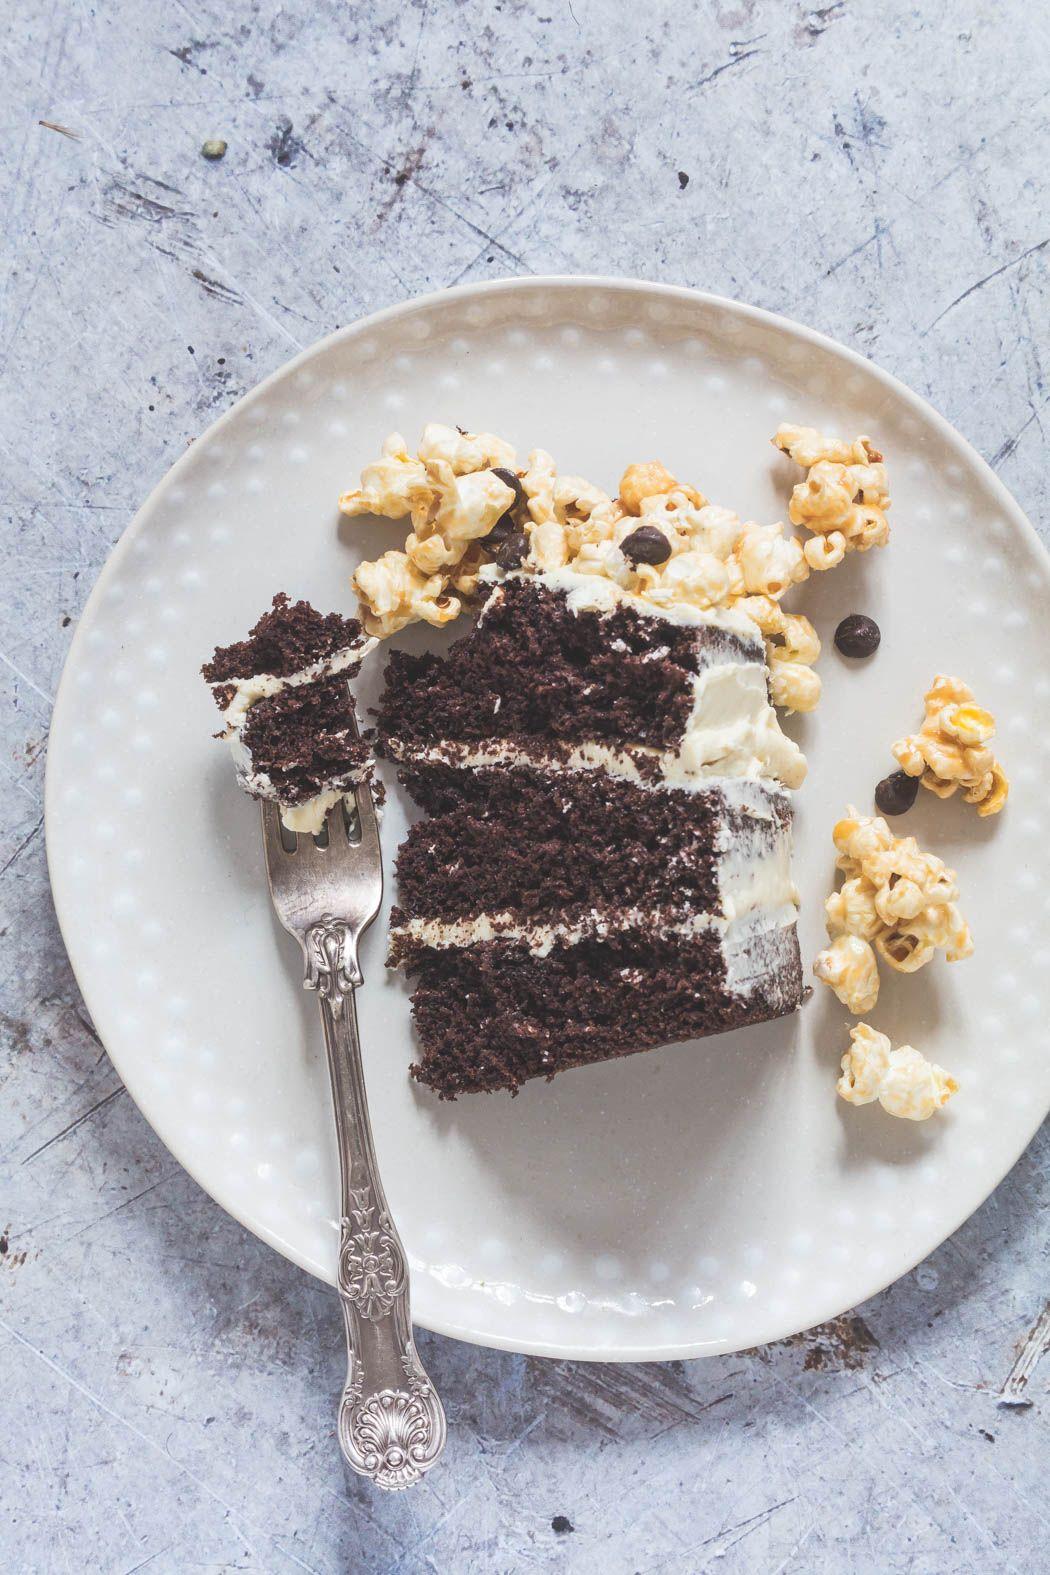 Chocolate Cake With Caramel Chip Popcorn Chunks And A Vanilla Ercream Icing